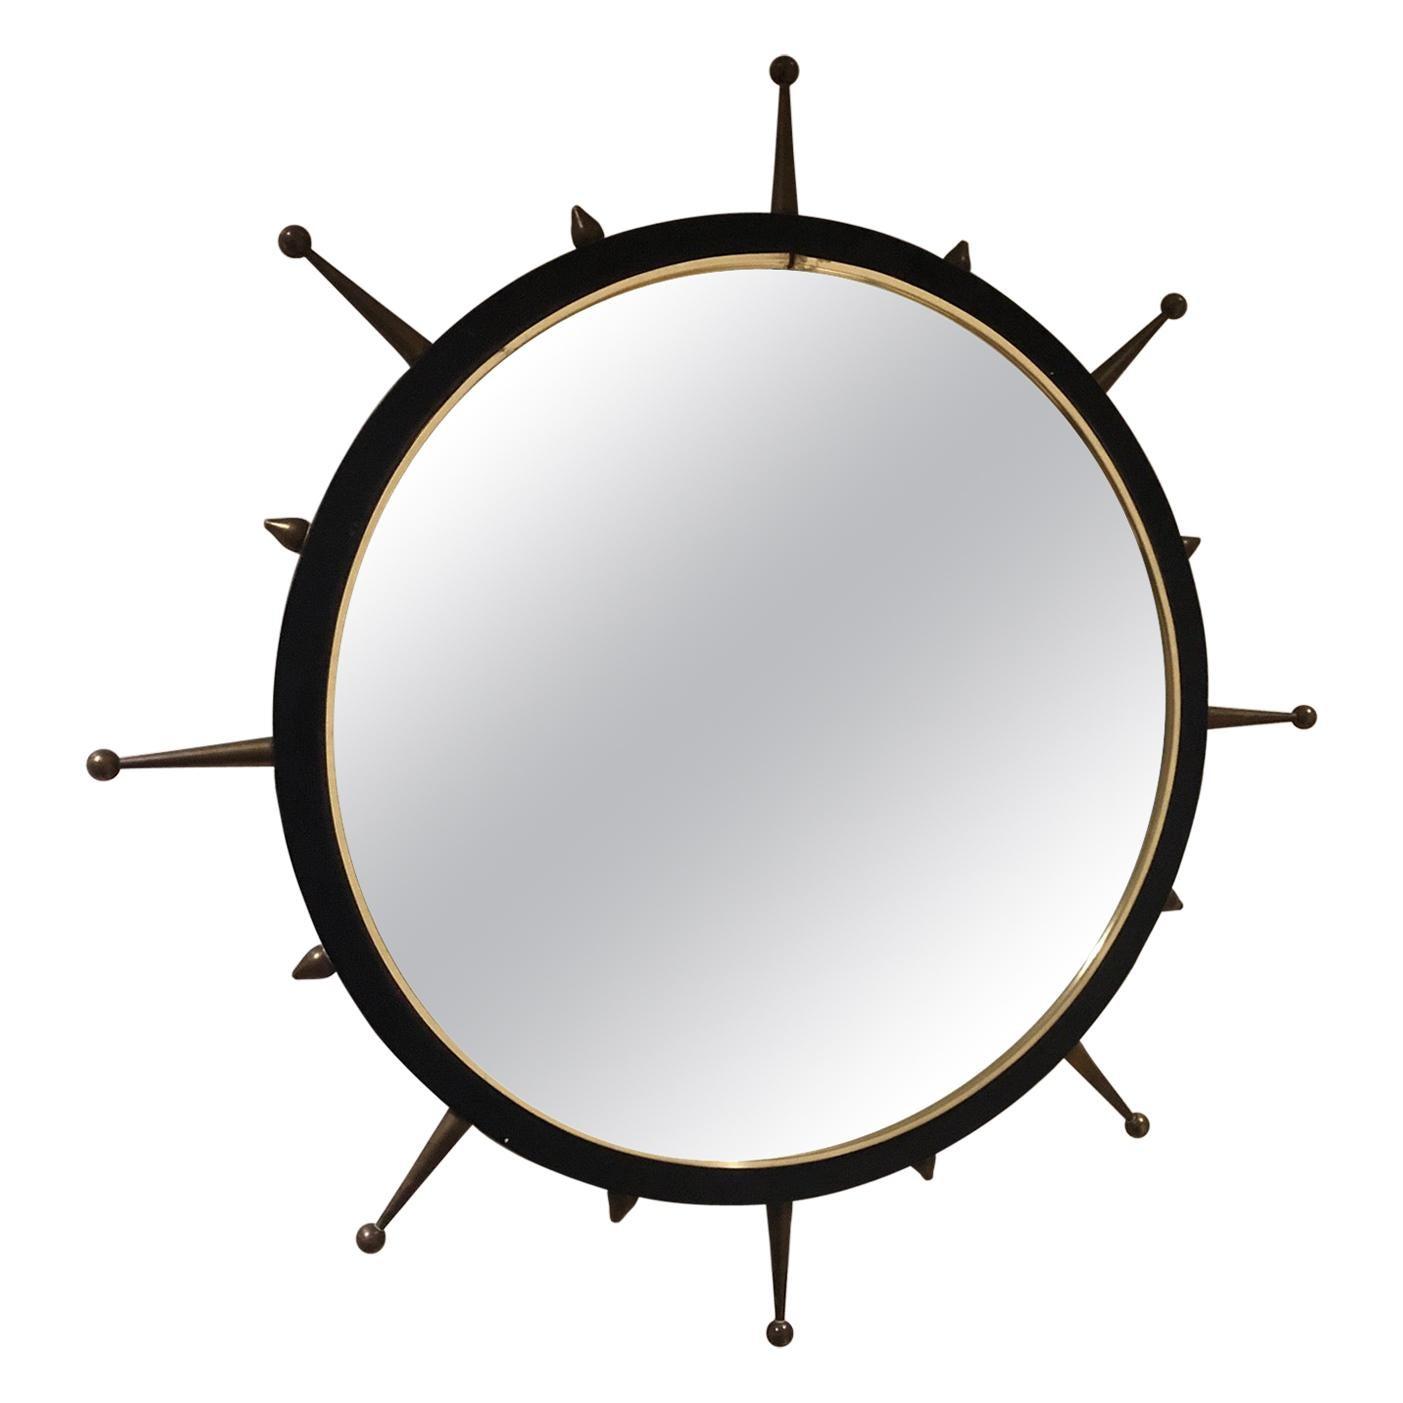 Midcentury Sunburst Mirror with Spikes